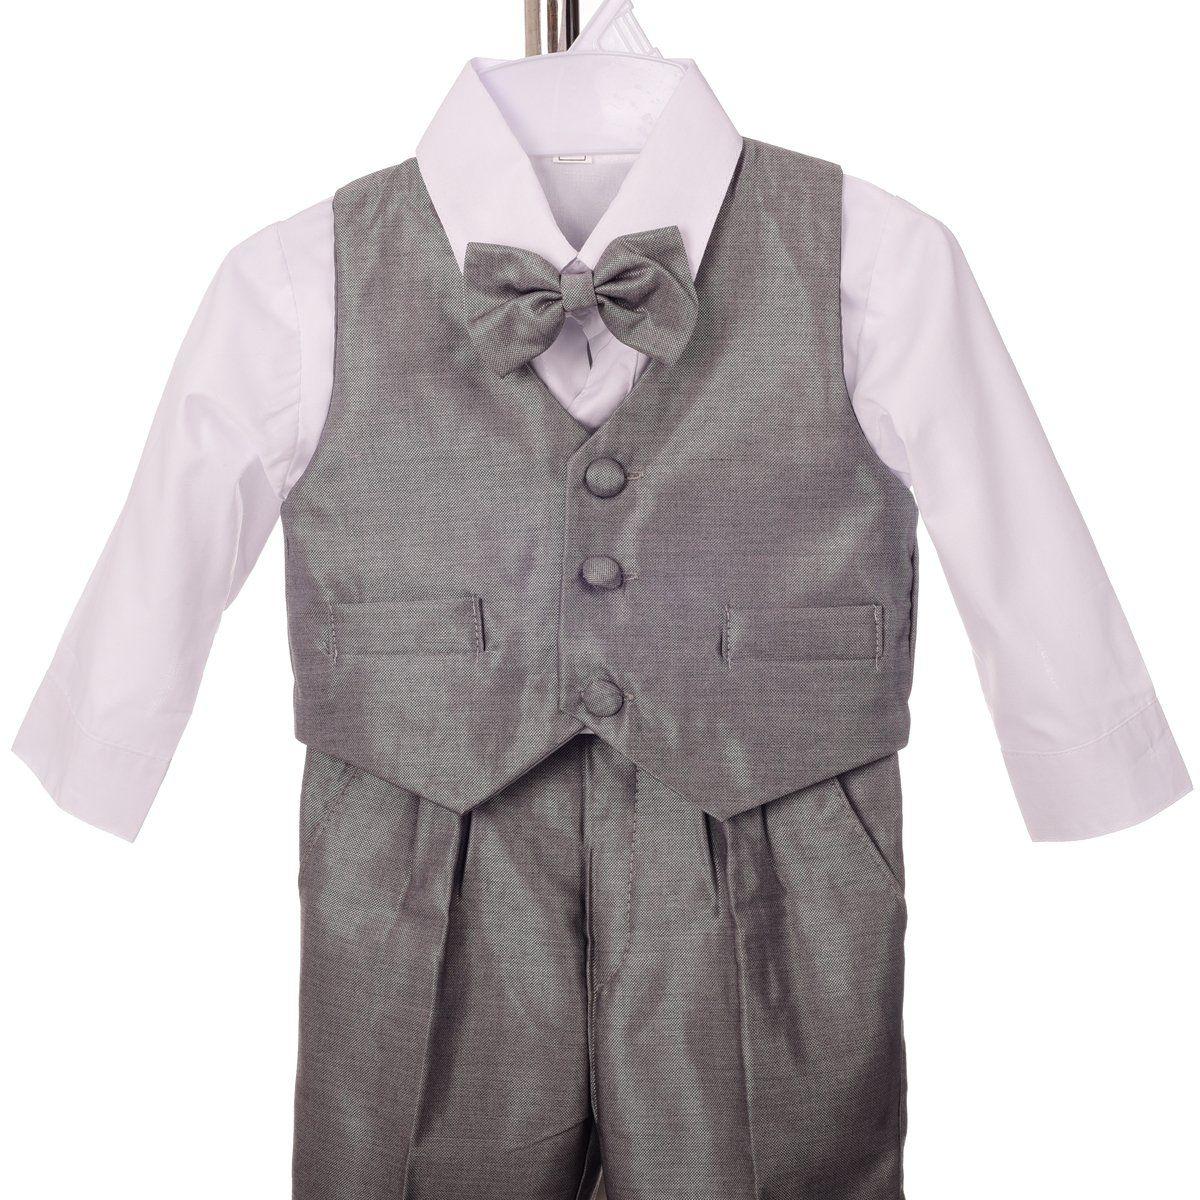 Joey Couture Little Boys Little Tuxedo No Tail Suit